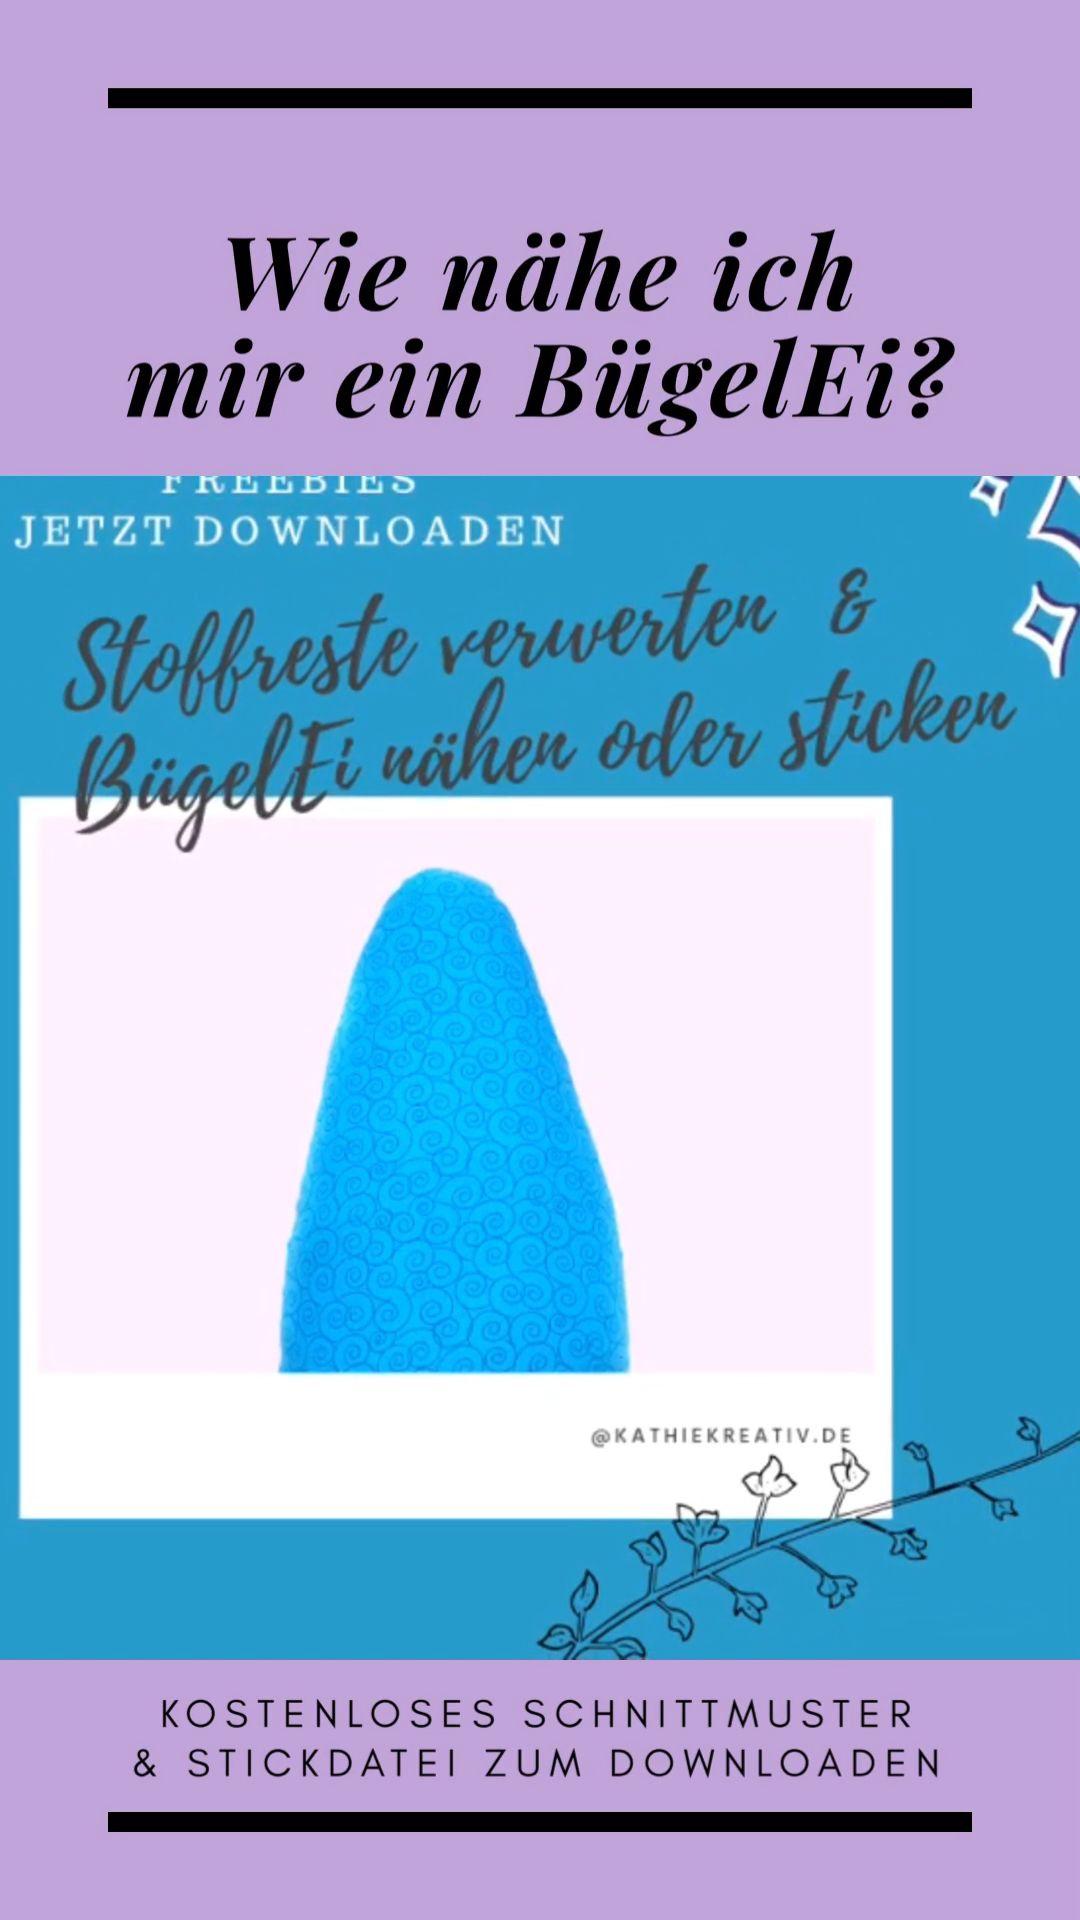 BügelEi nähen oder sticken • KathieKreativ.de